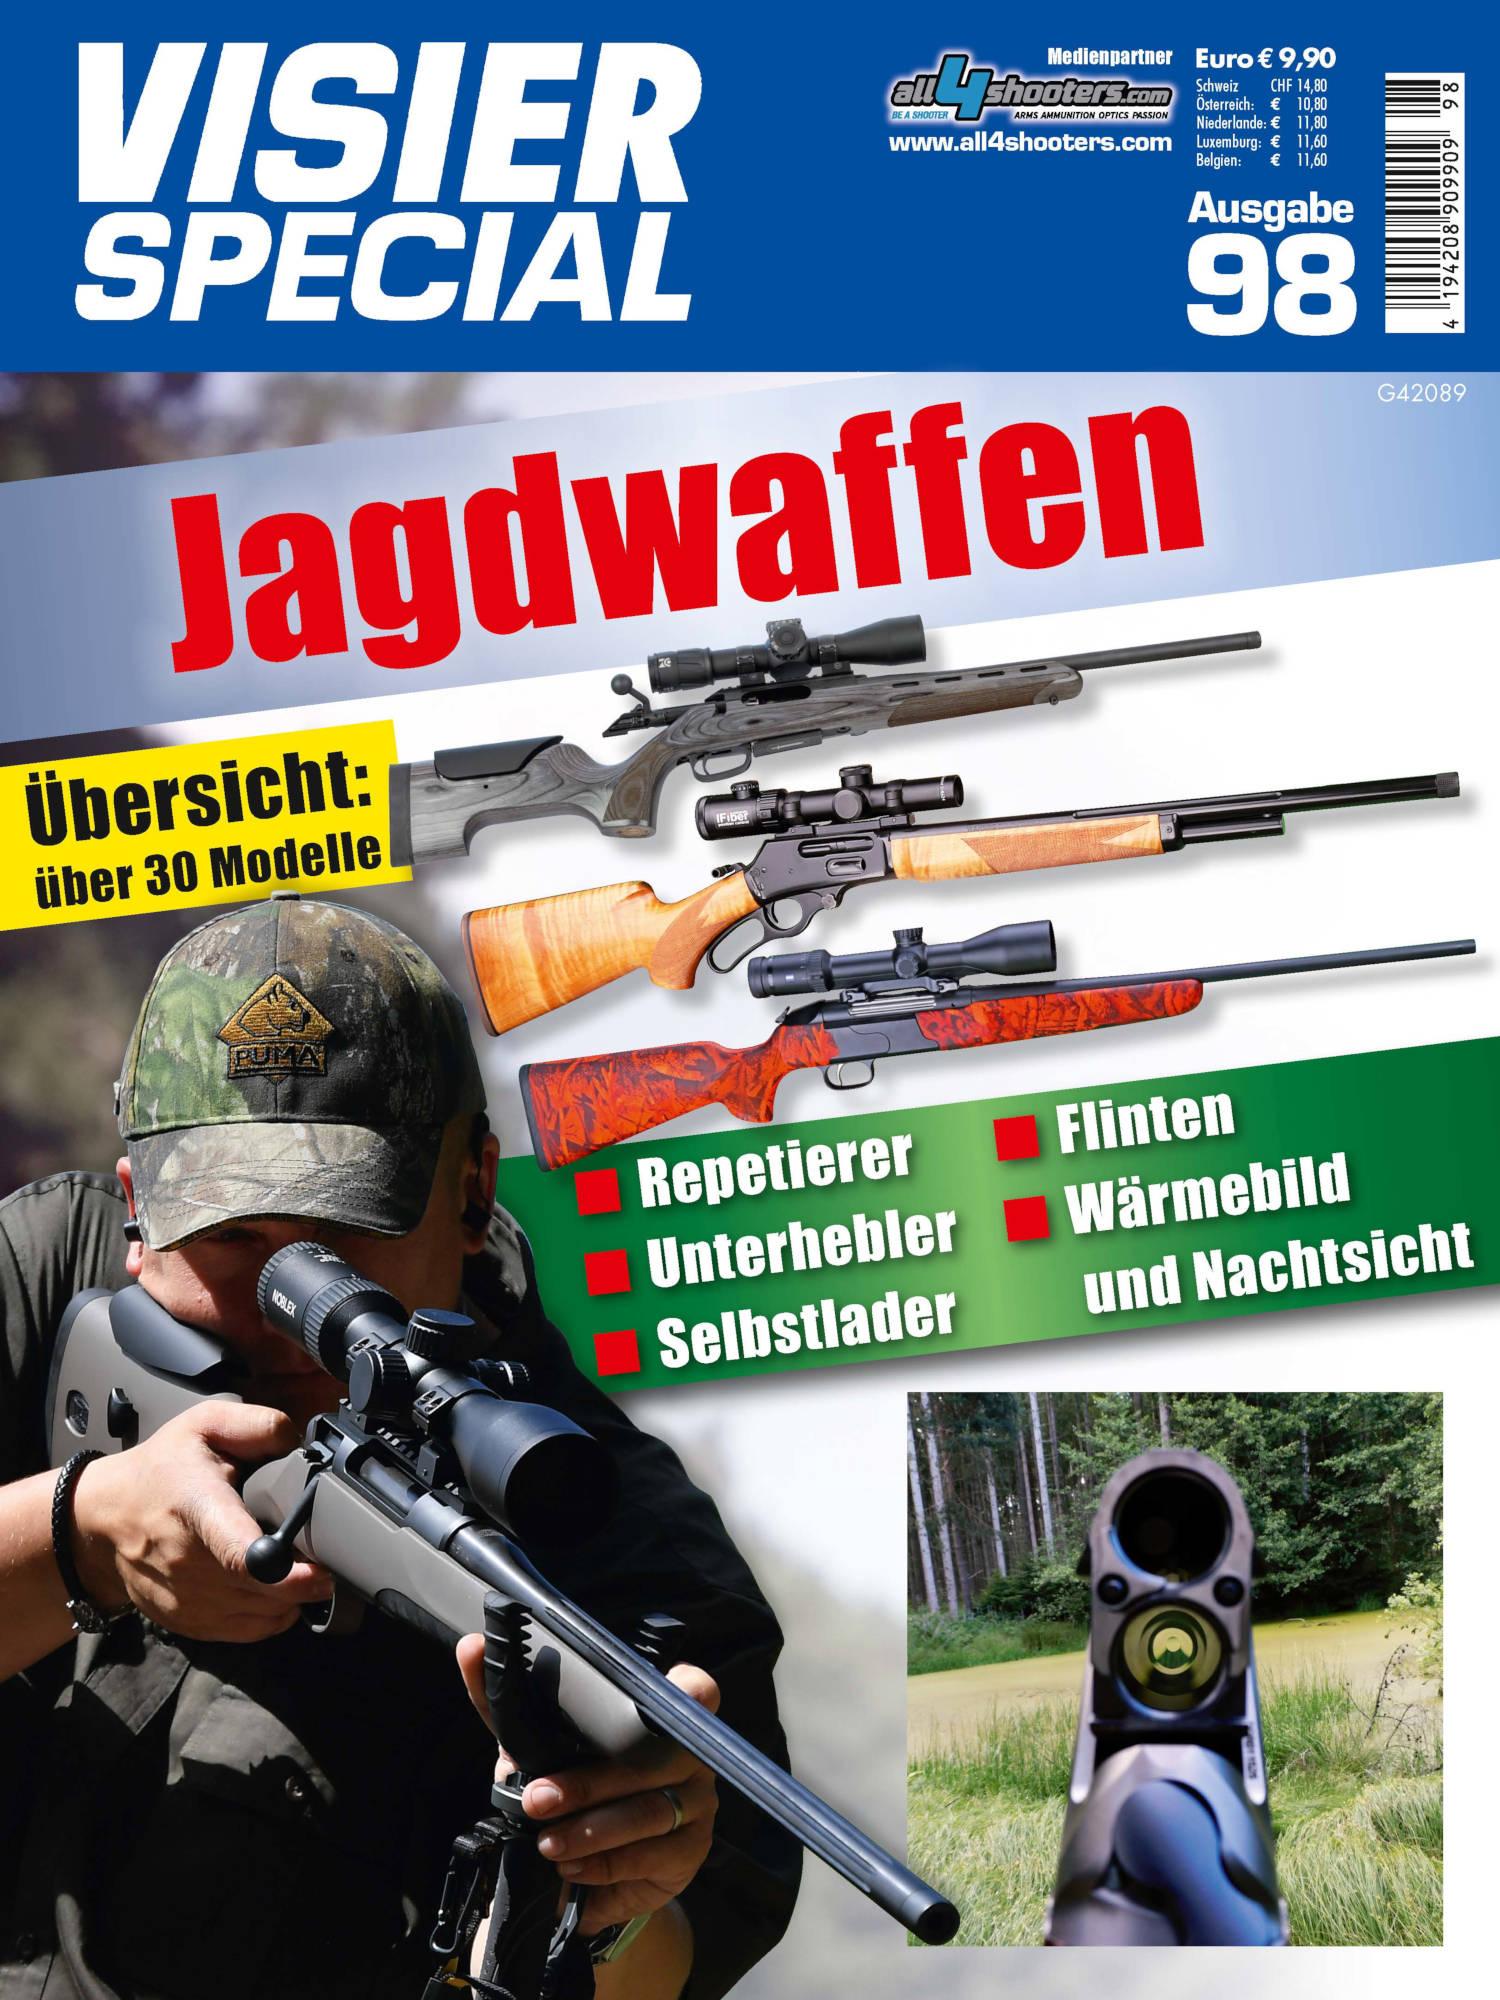 VISIER Special 98